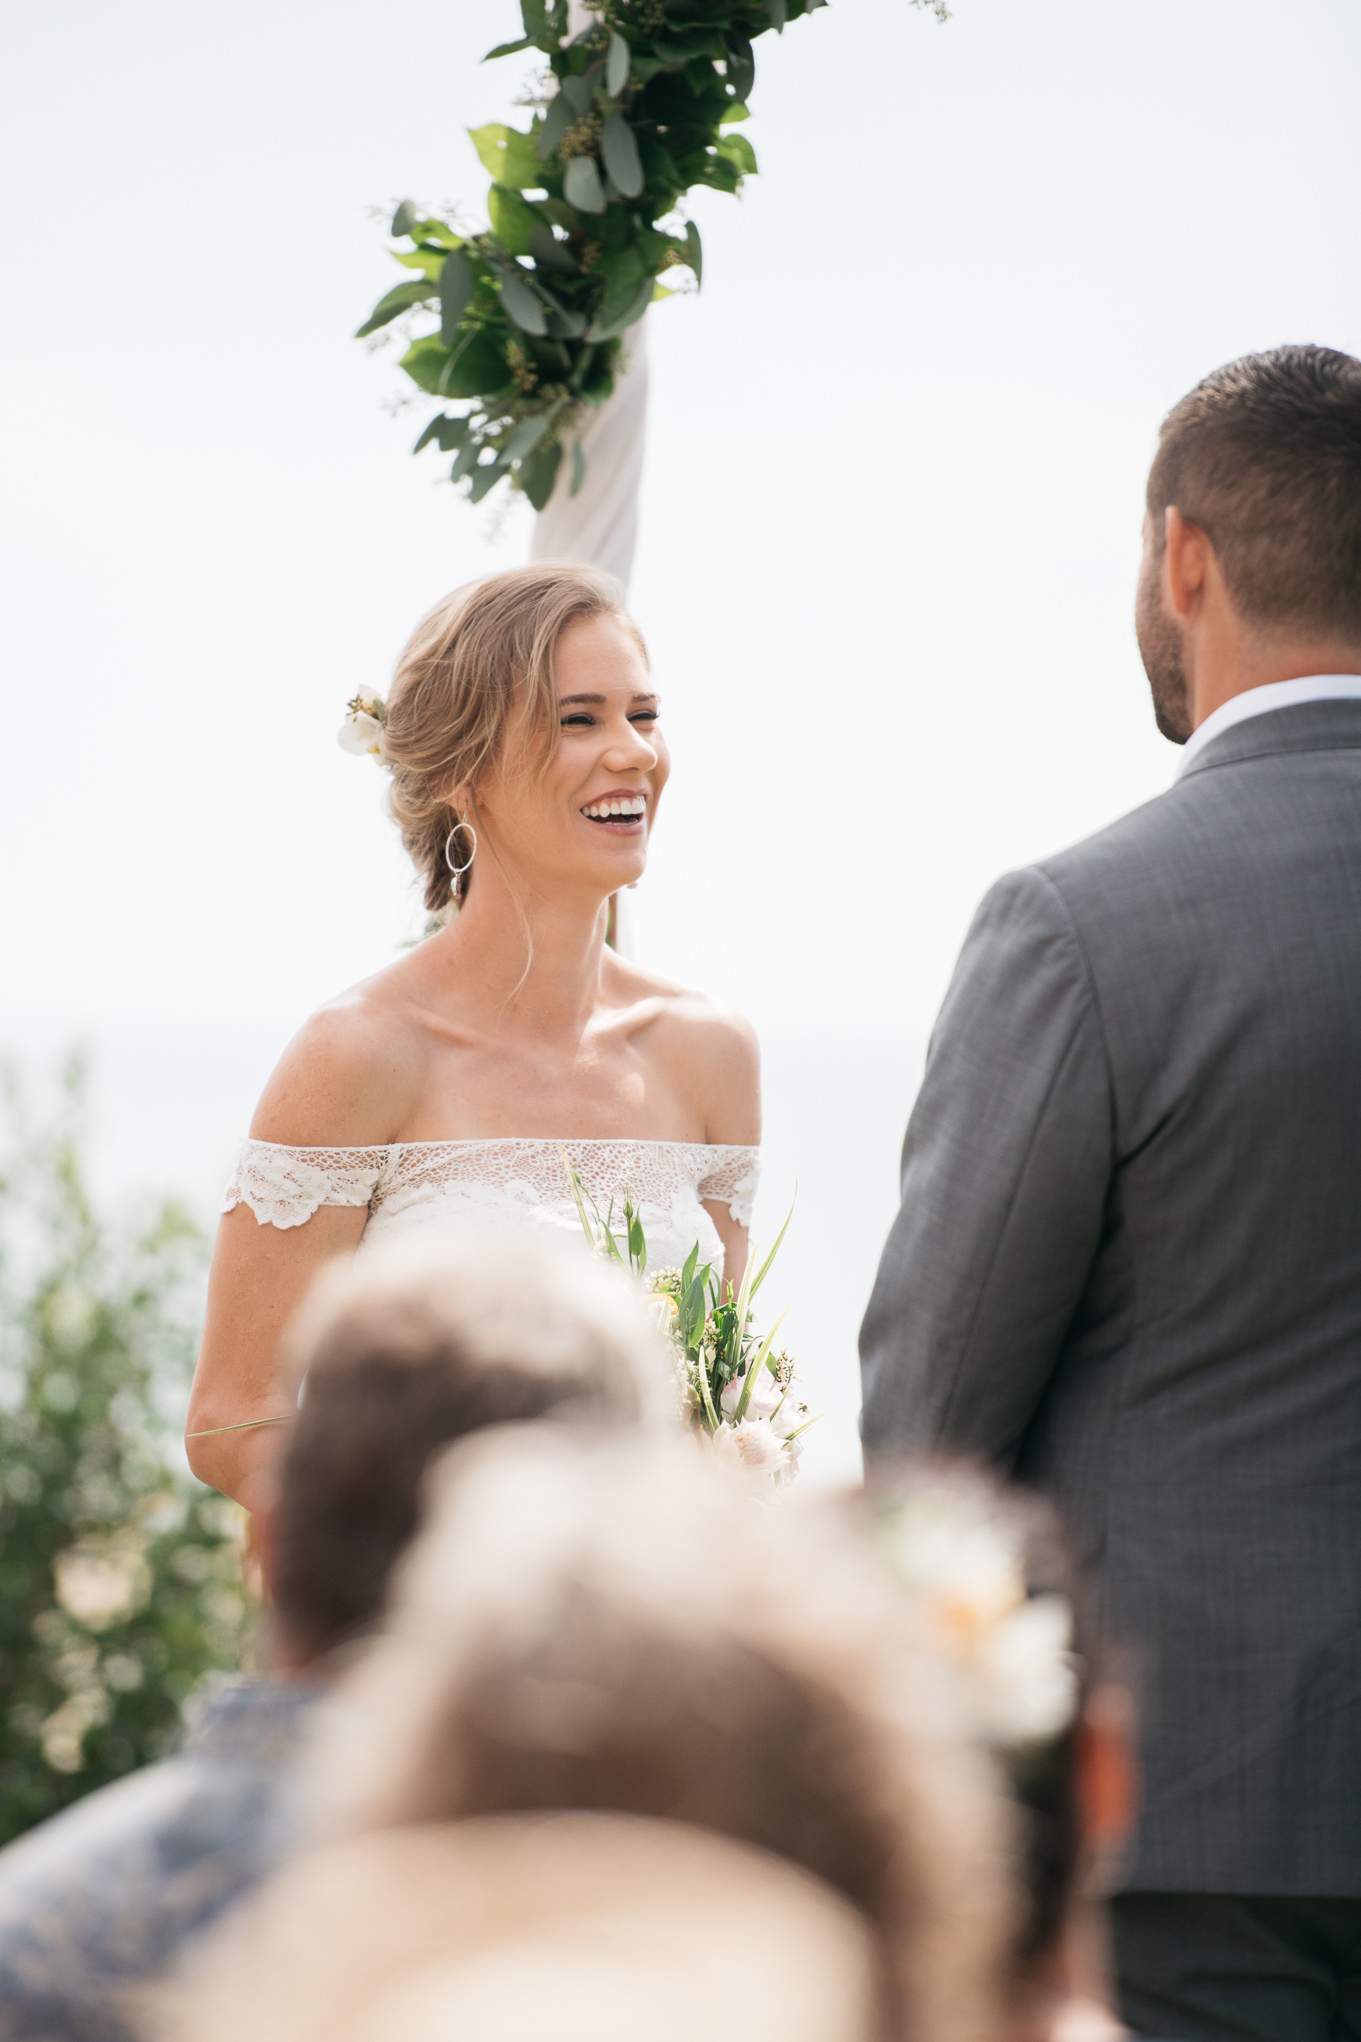 258_ONL_Jenny_Ken_Wedding_Trevor_Hooper_Photo.jpg